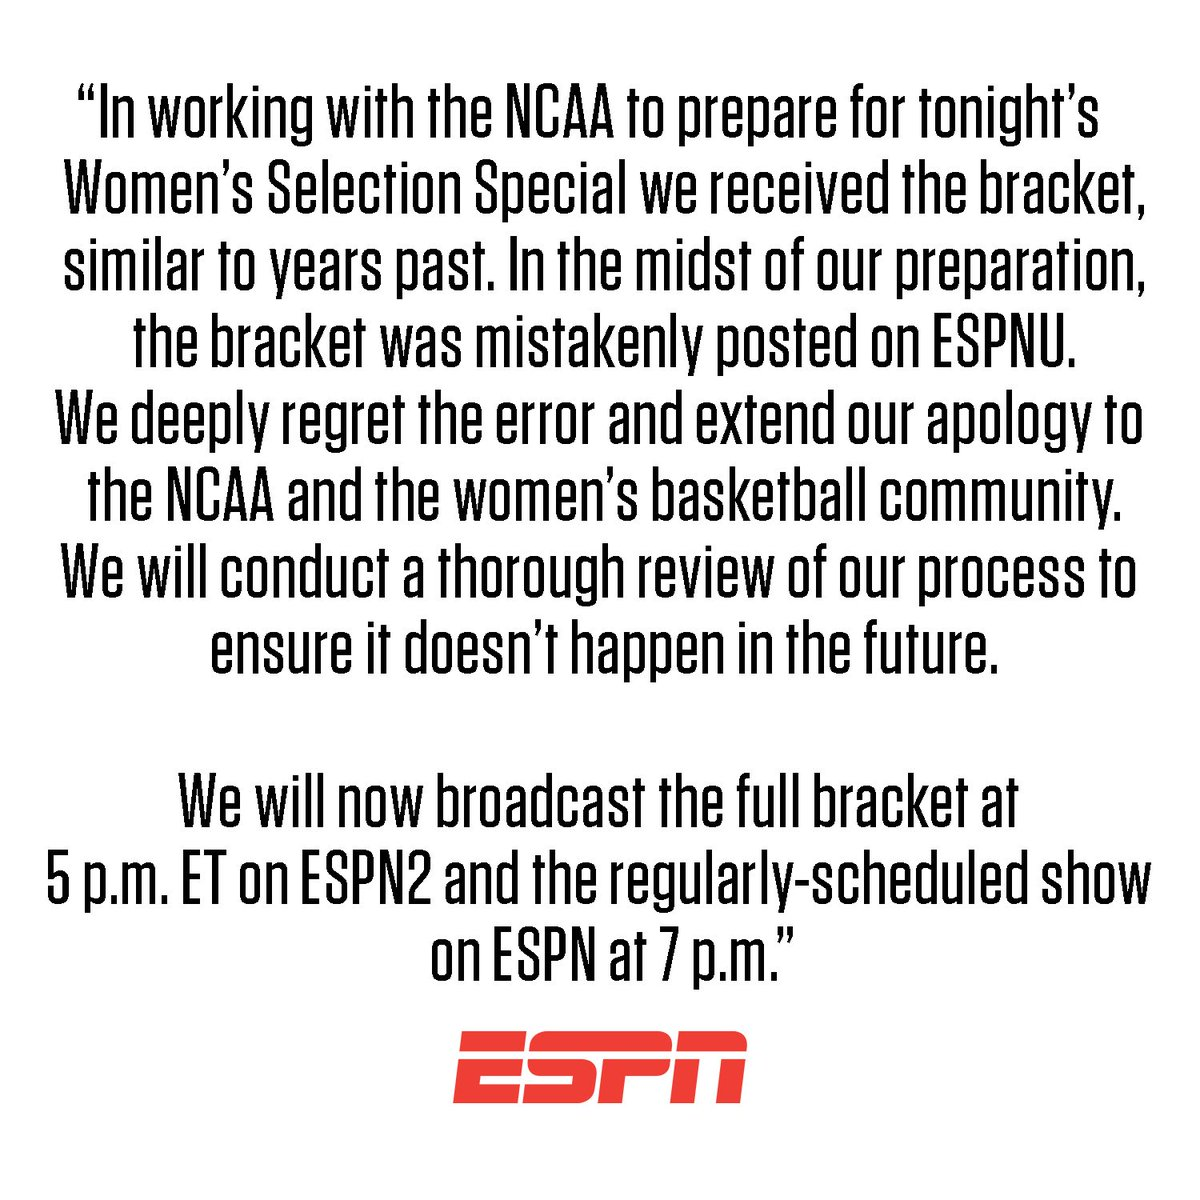 ESPN Statement Regarding the NCAA Women's Tournament Bracket https://es.pn/2TQj0VP